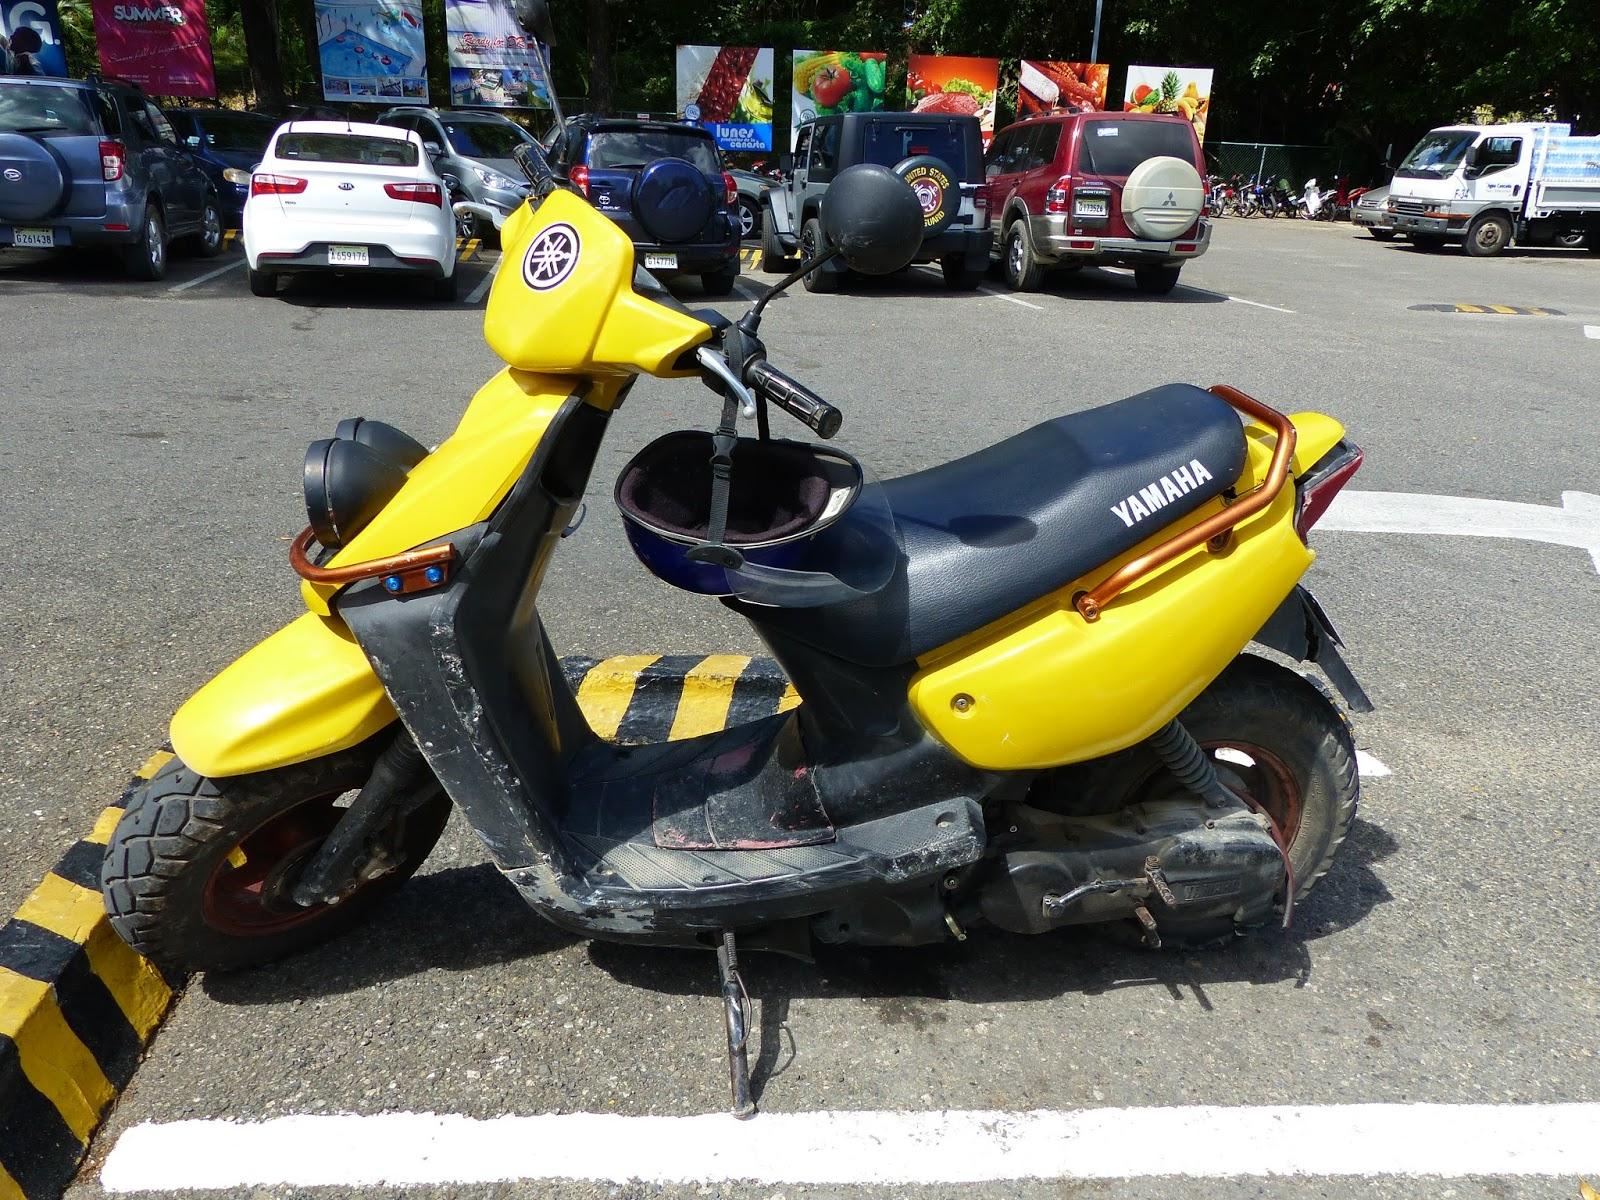 Bonhams Kawasaki Ar Auction Sold